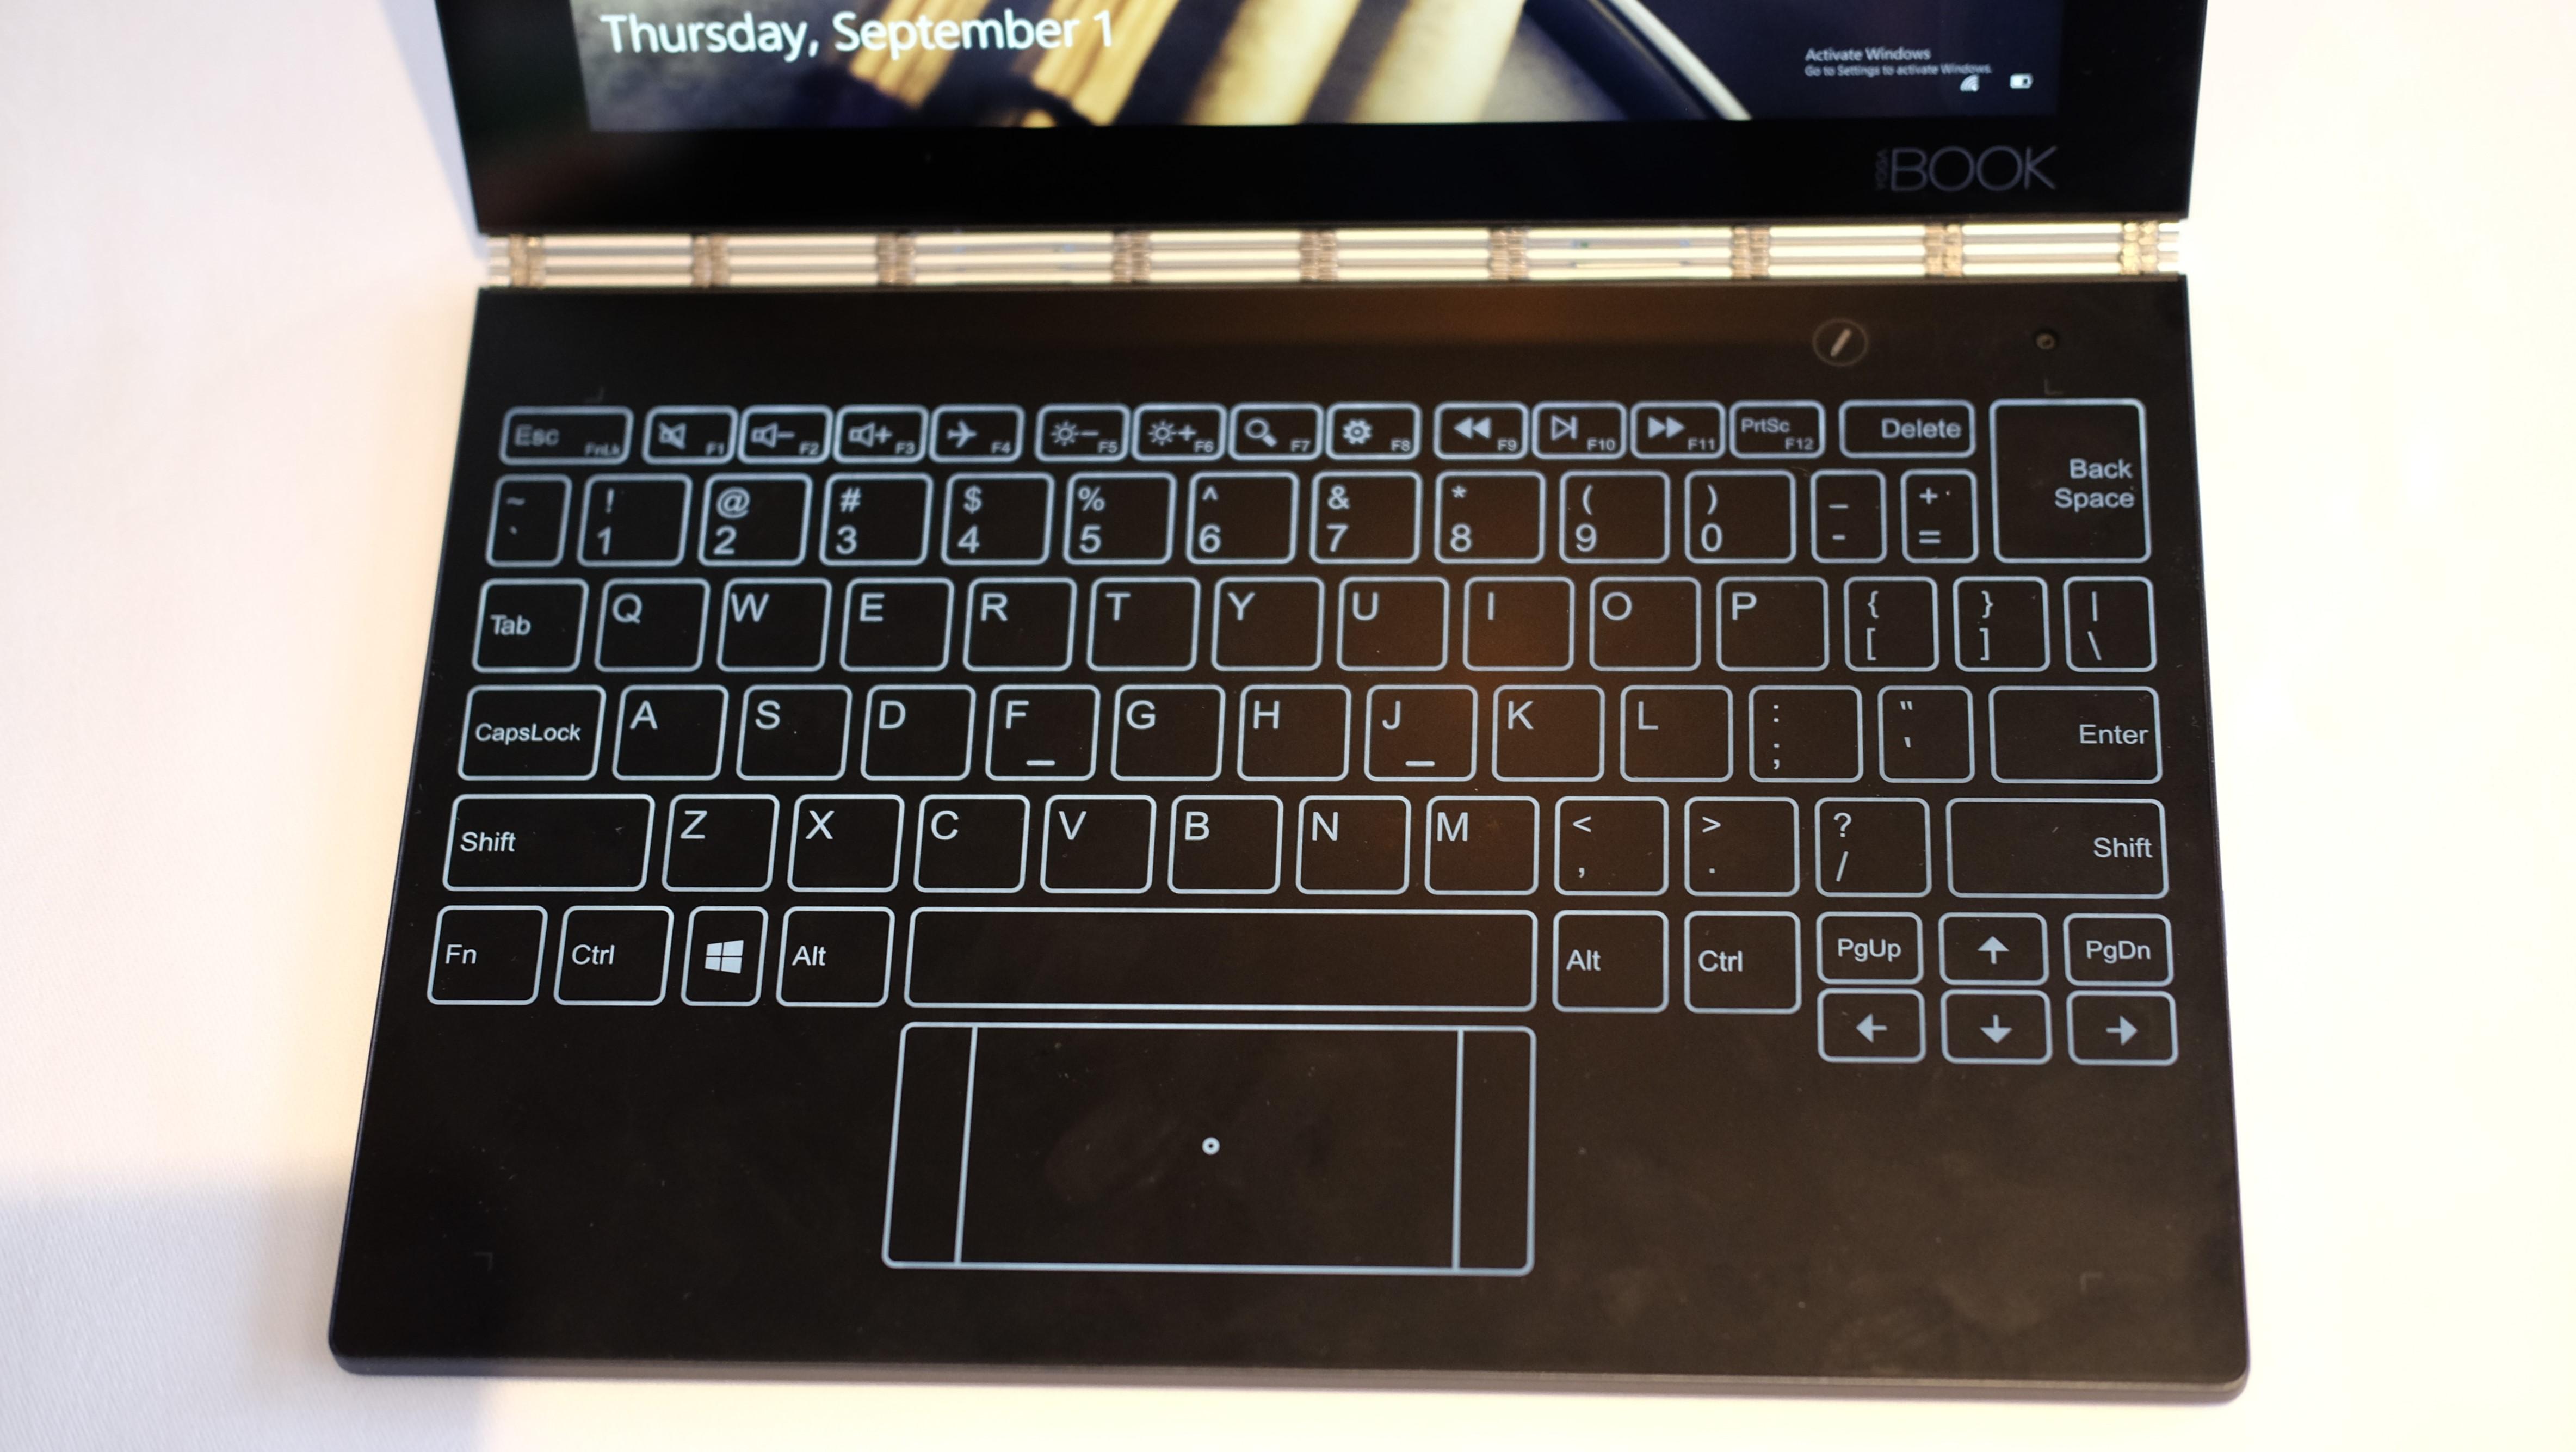 Tastaturet krever absolutt litt tilvenning.